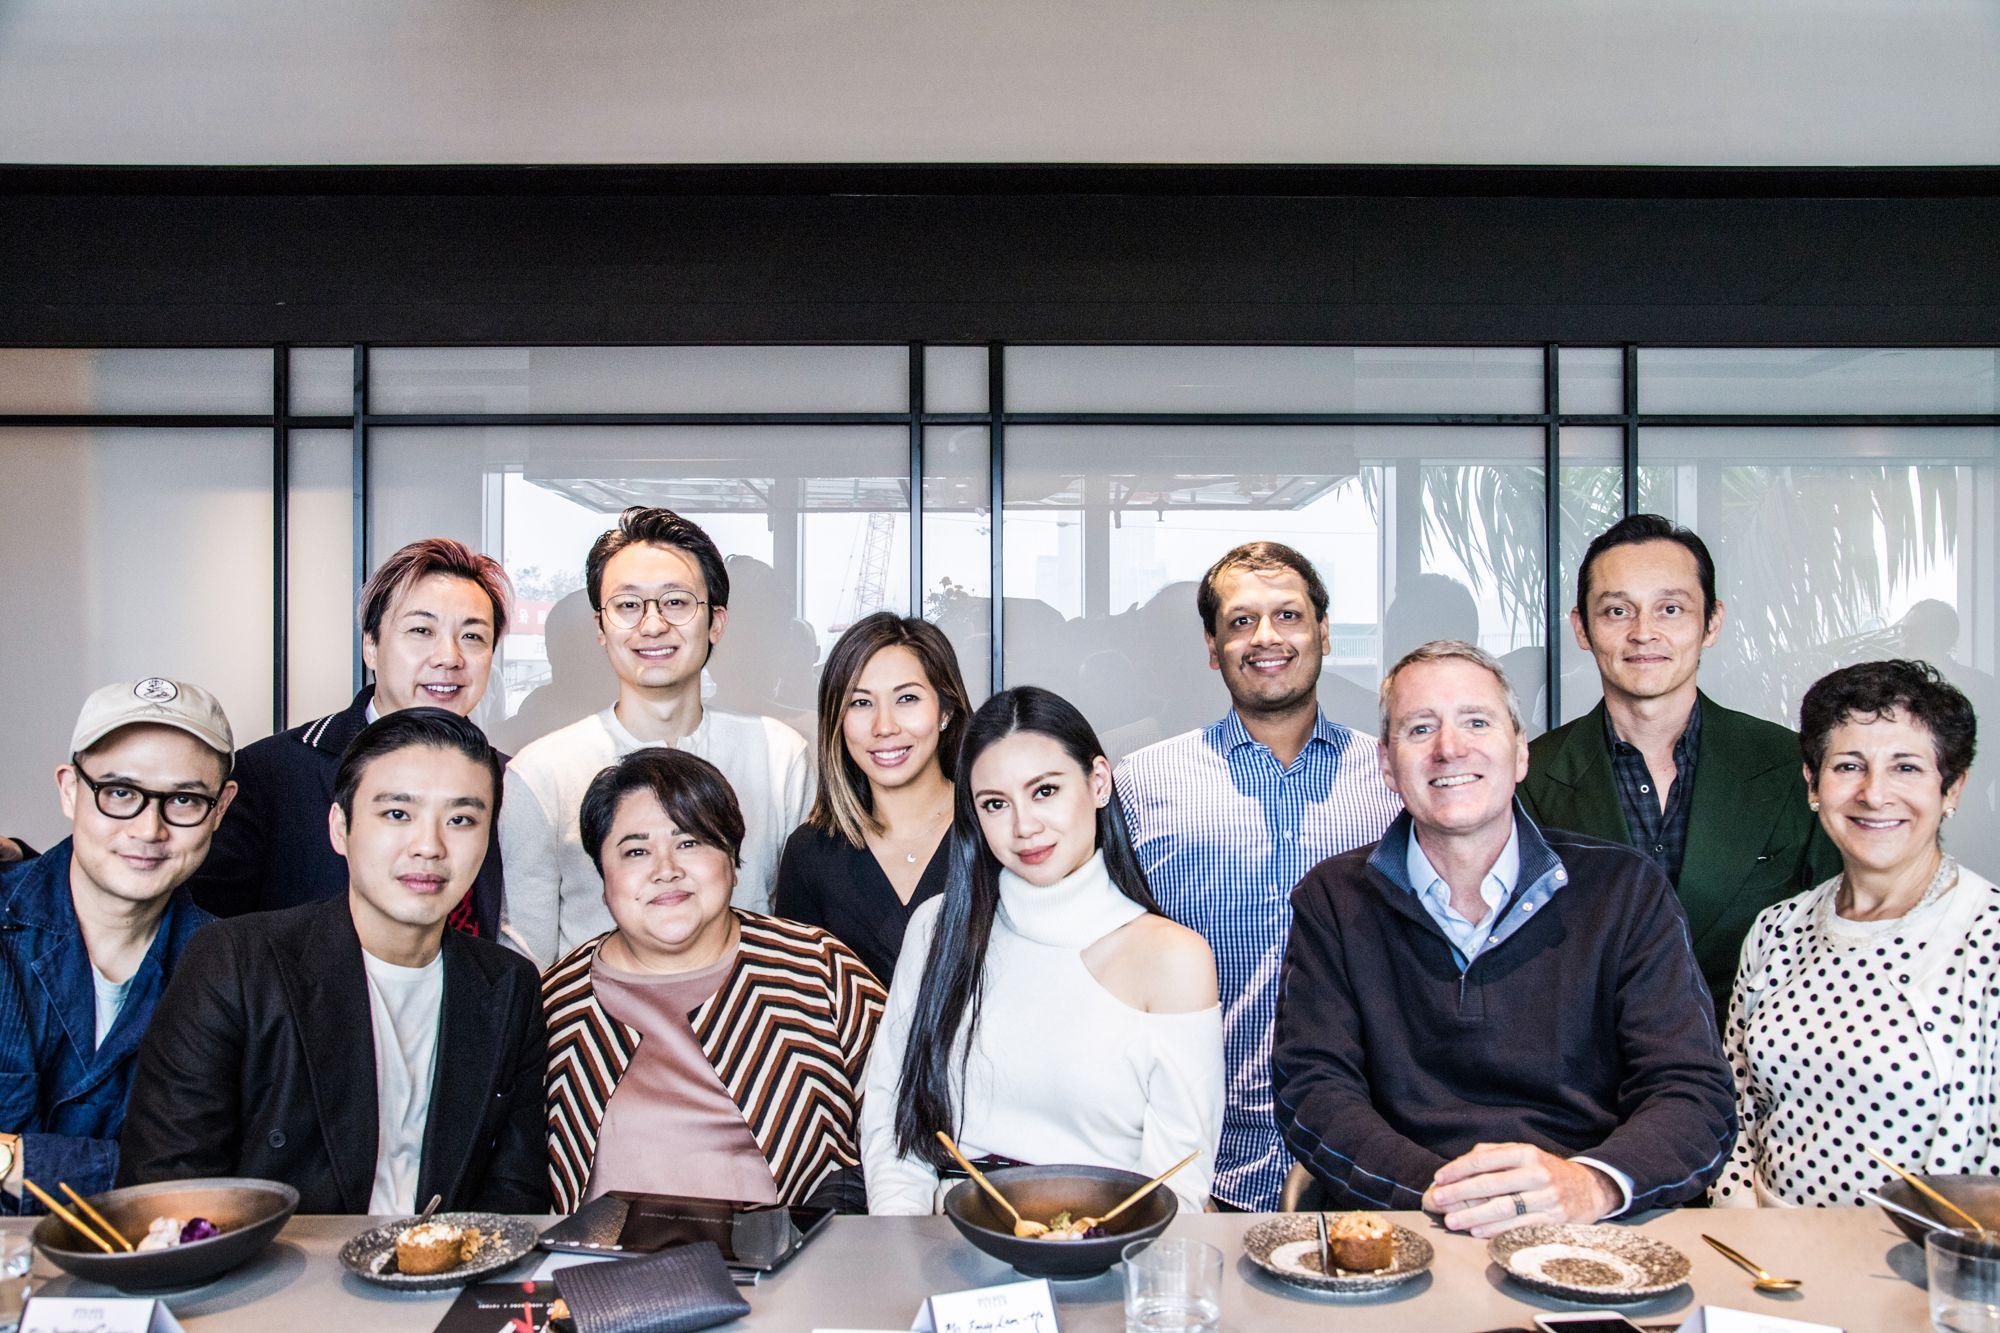 Back row: Francis Cheng, Chibo Tang, Tamara Lamunière, Manav Gupta, Sean Fitzpatrick. Front row: Federico Tan, Jonathan Cheung, Cathy Chon, Emily Lam-Ho, John Wood, Ruth Shapiro